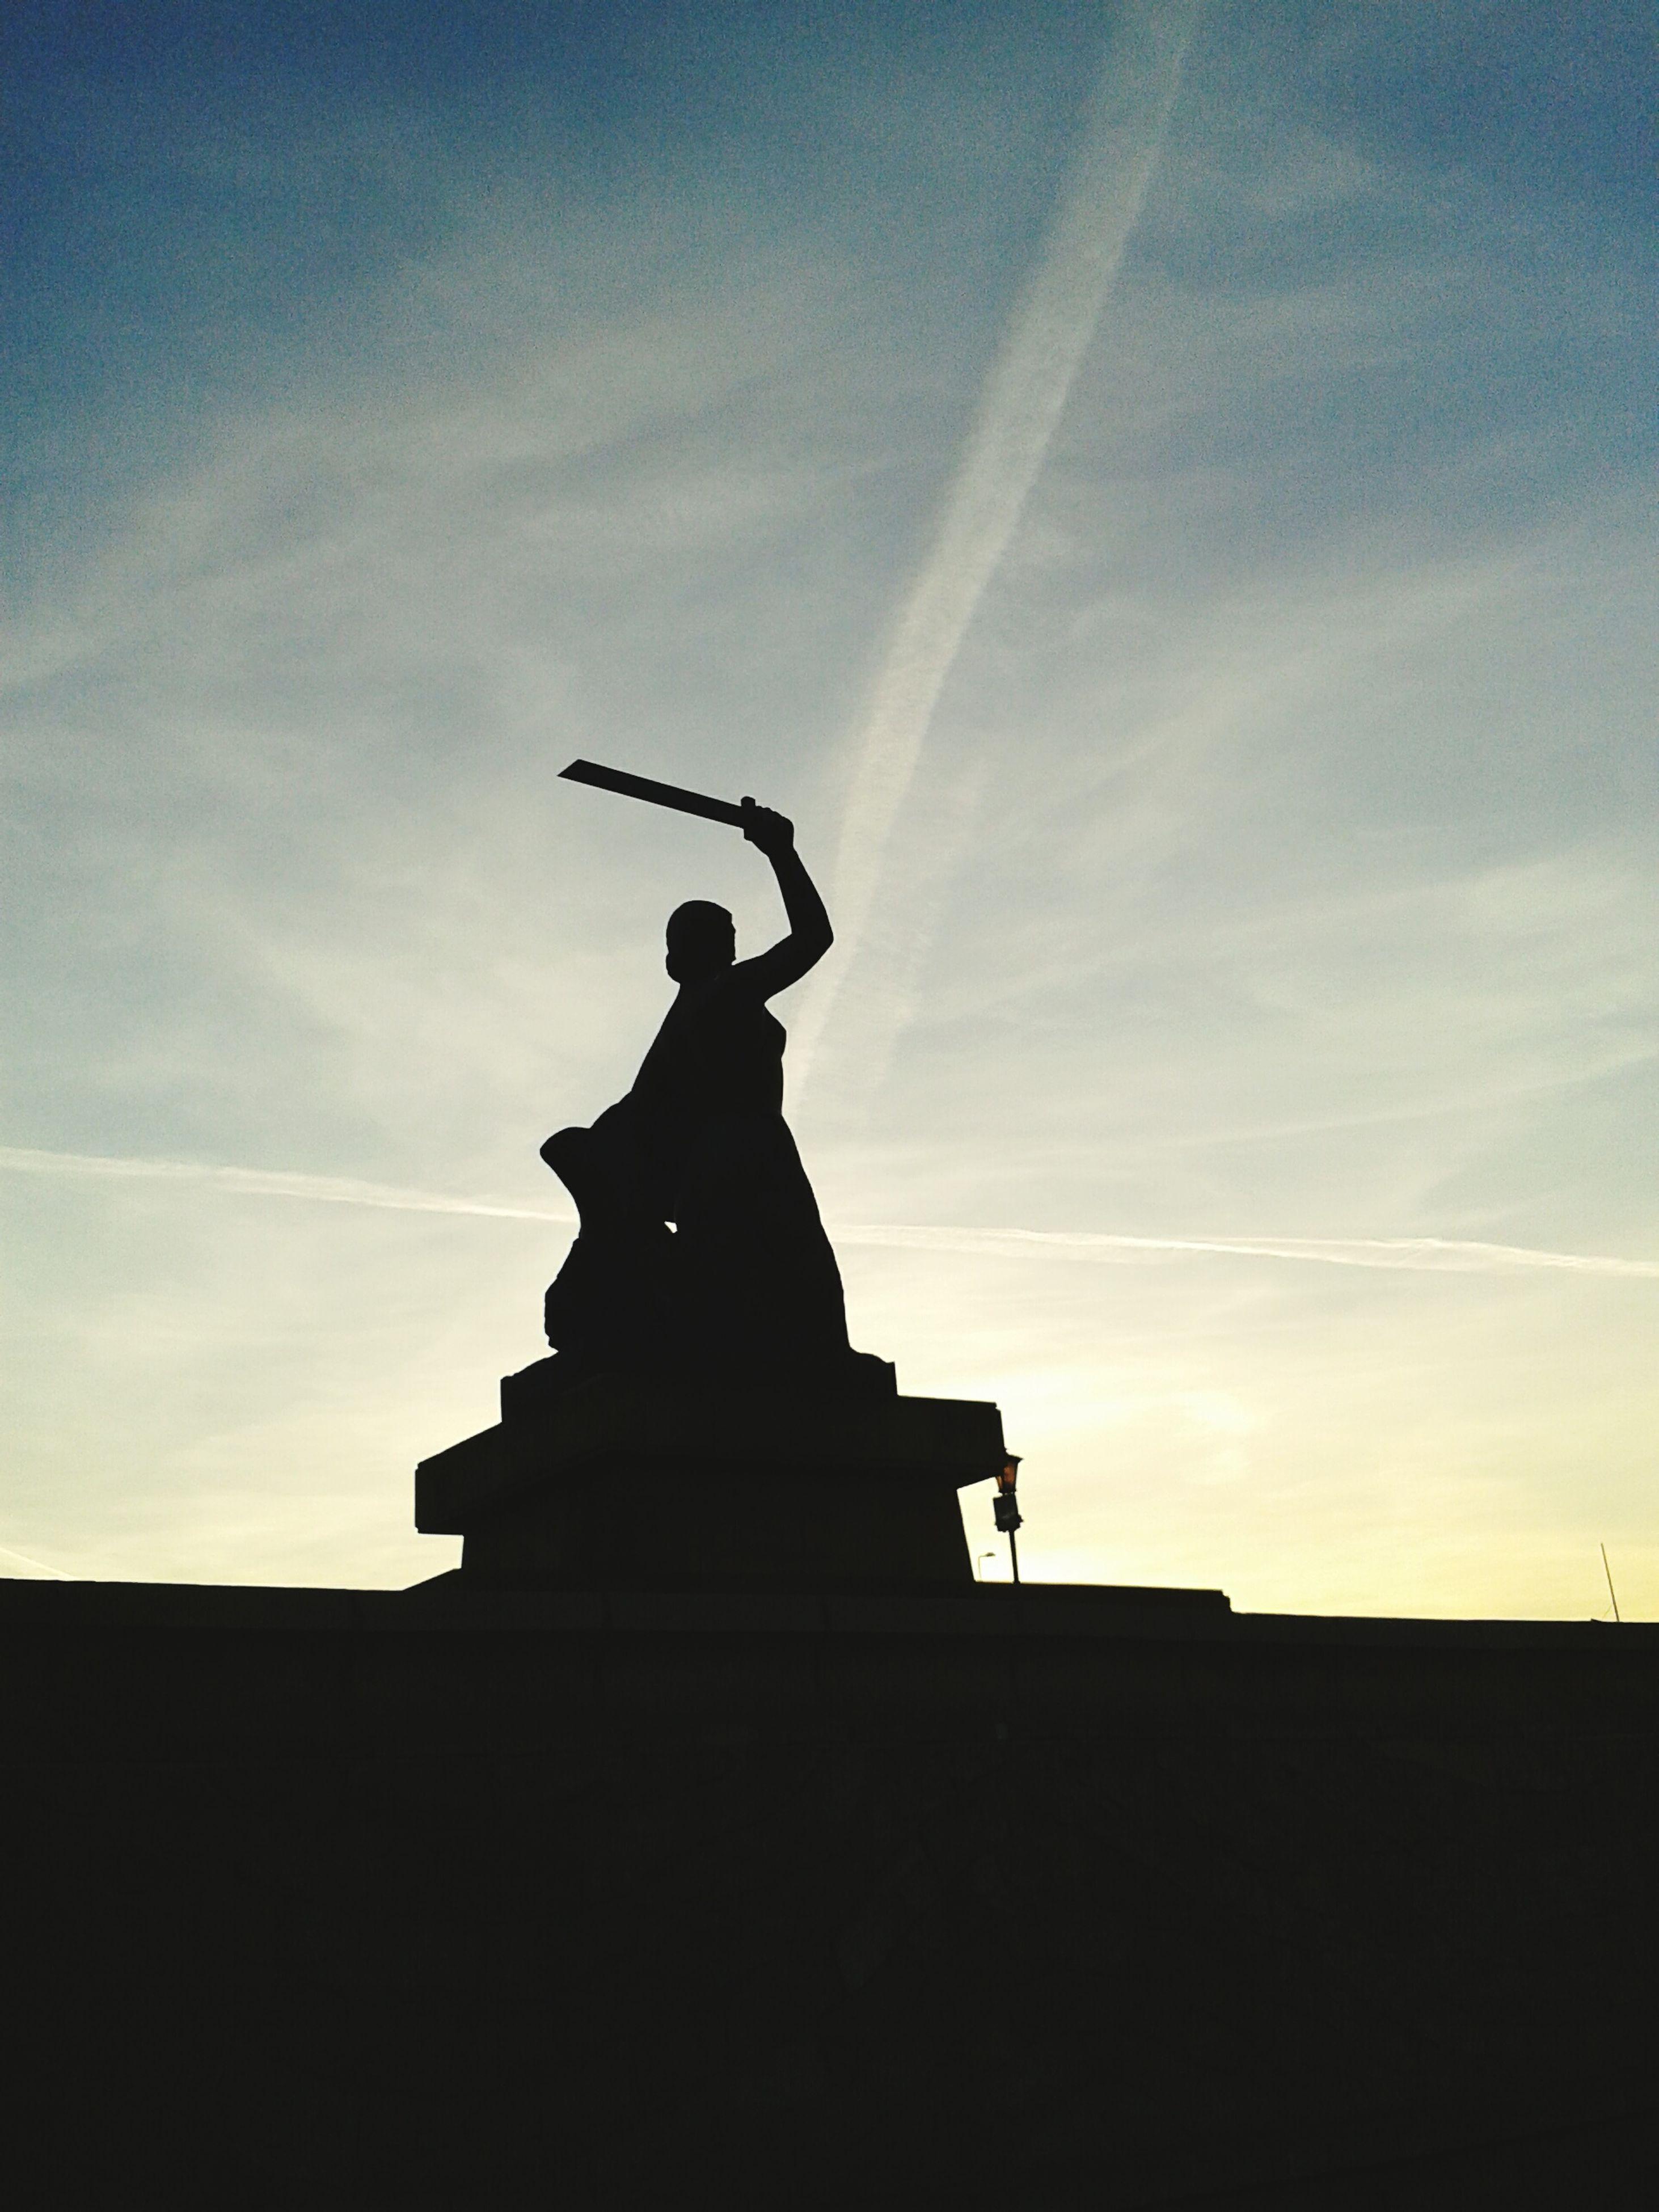 statue, silhouette, low angle view, sculpture, human representation, sky, art and craft, art, built structure, building exterior, architecture, creativity, cloud - sky, religion, cloud, sunset, dusk